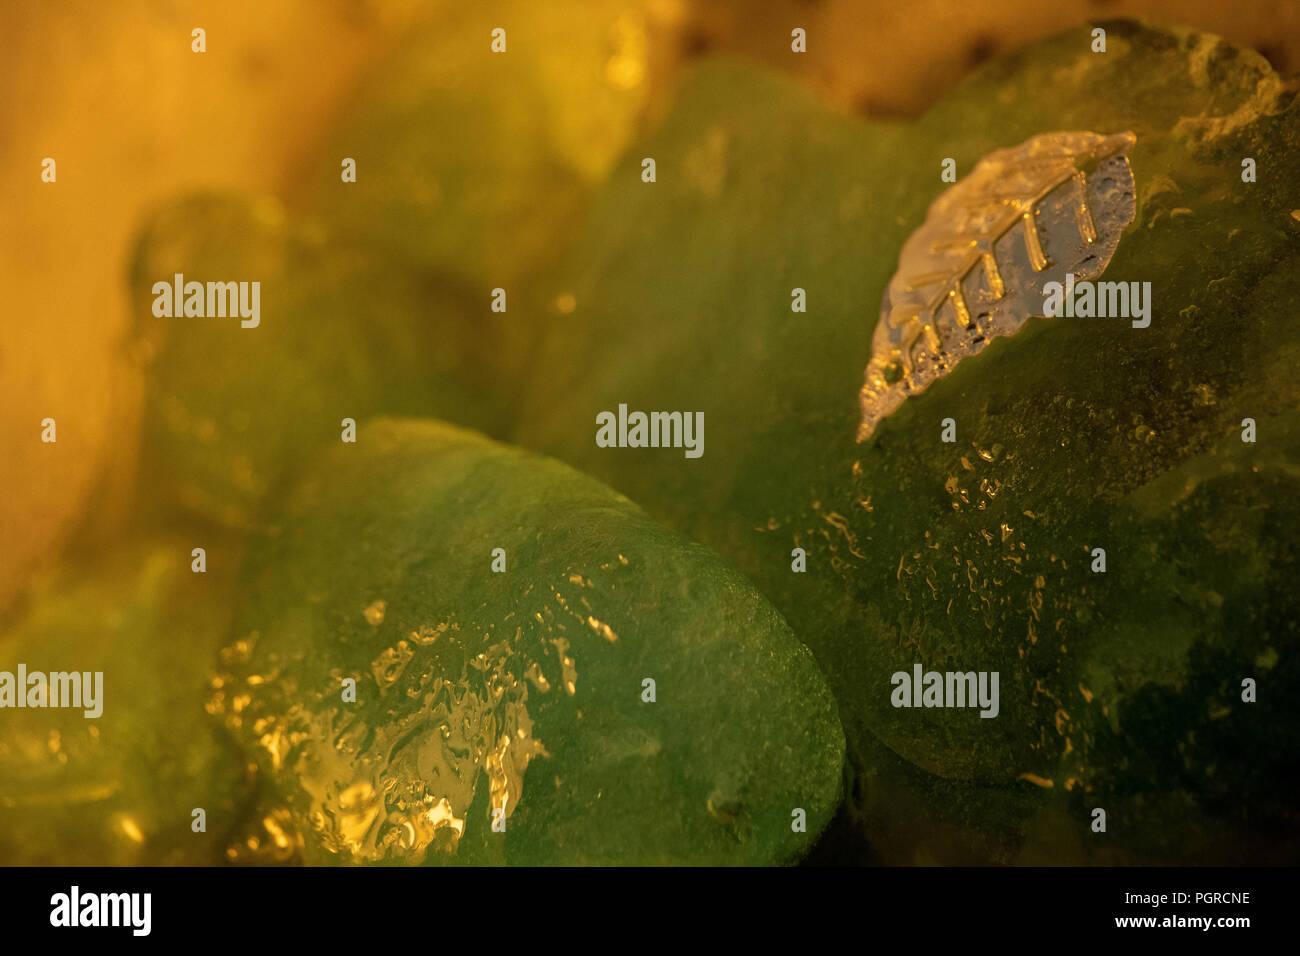 Kiwi Times - Abstract Ice Photography - Stock Image